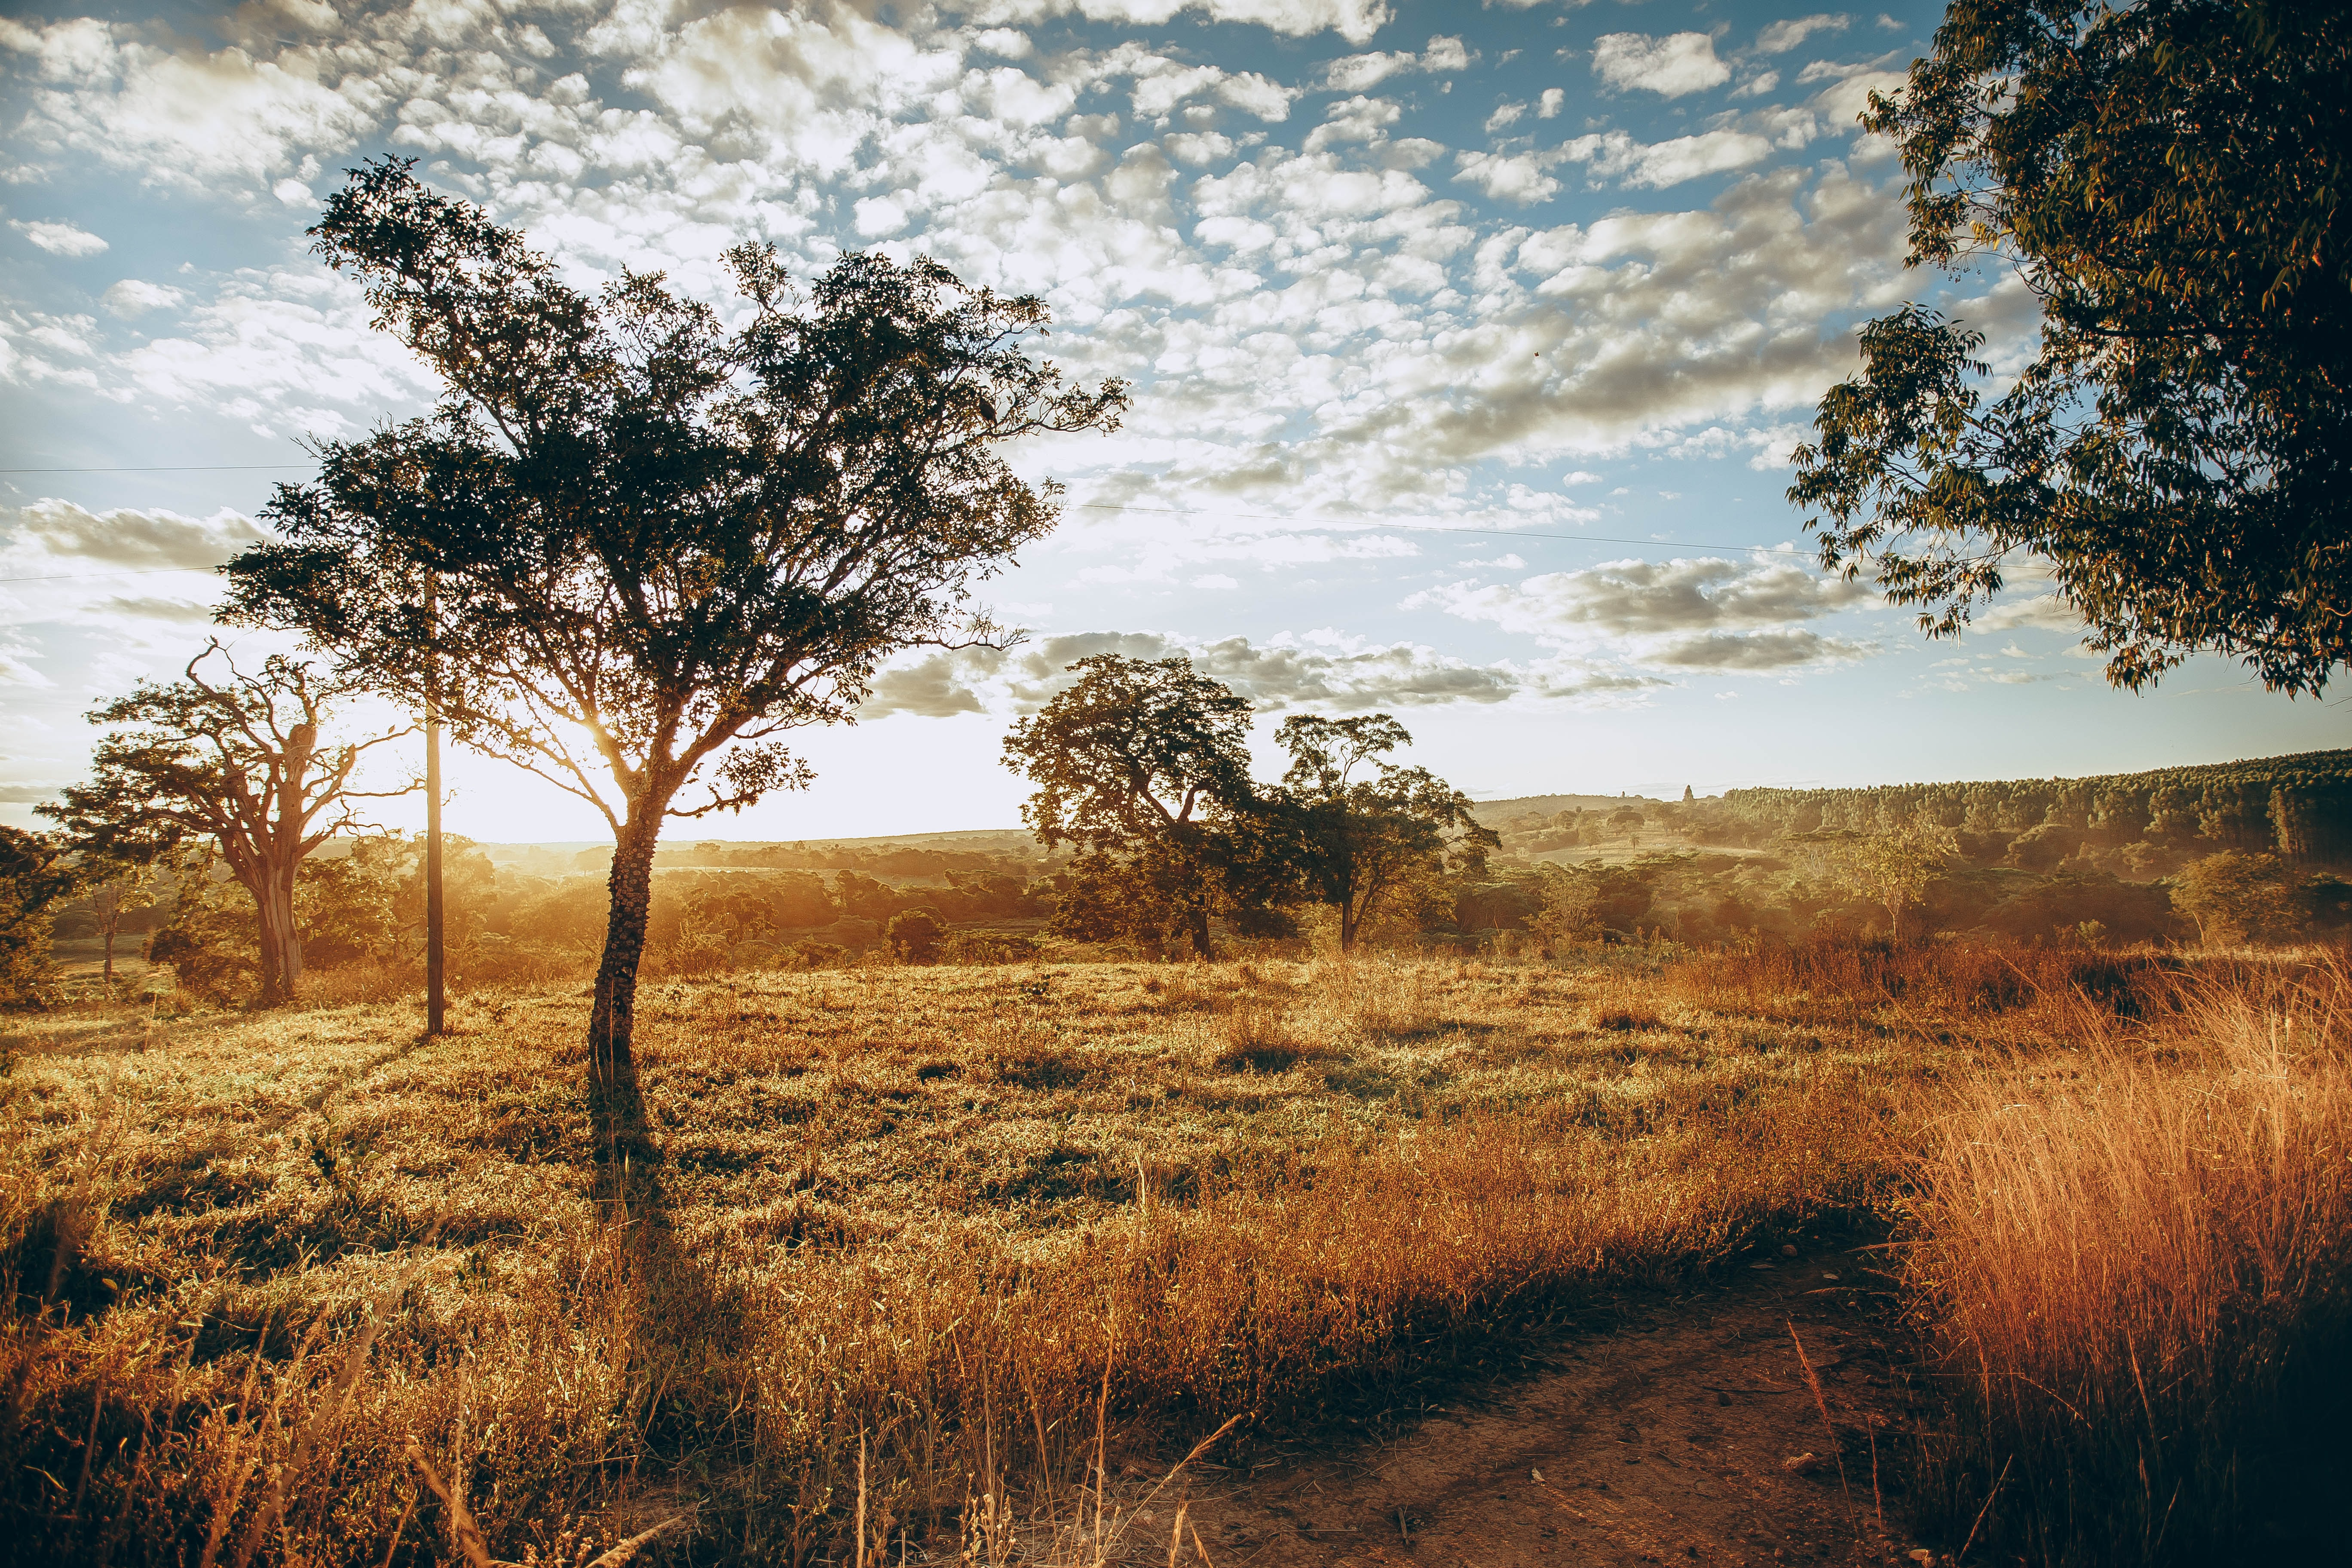 image of savanna